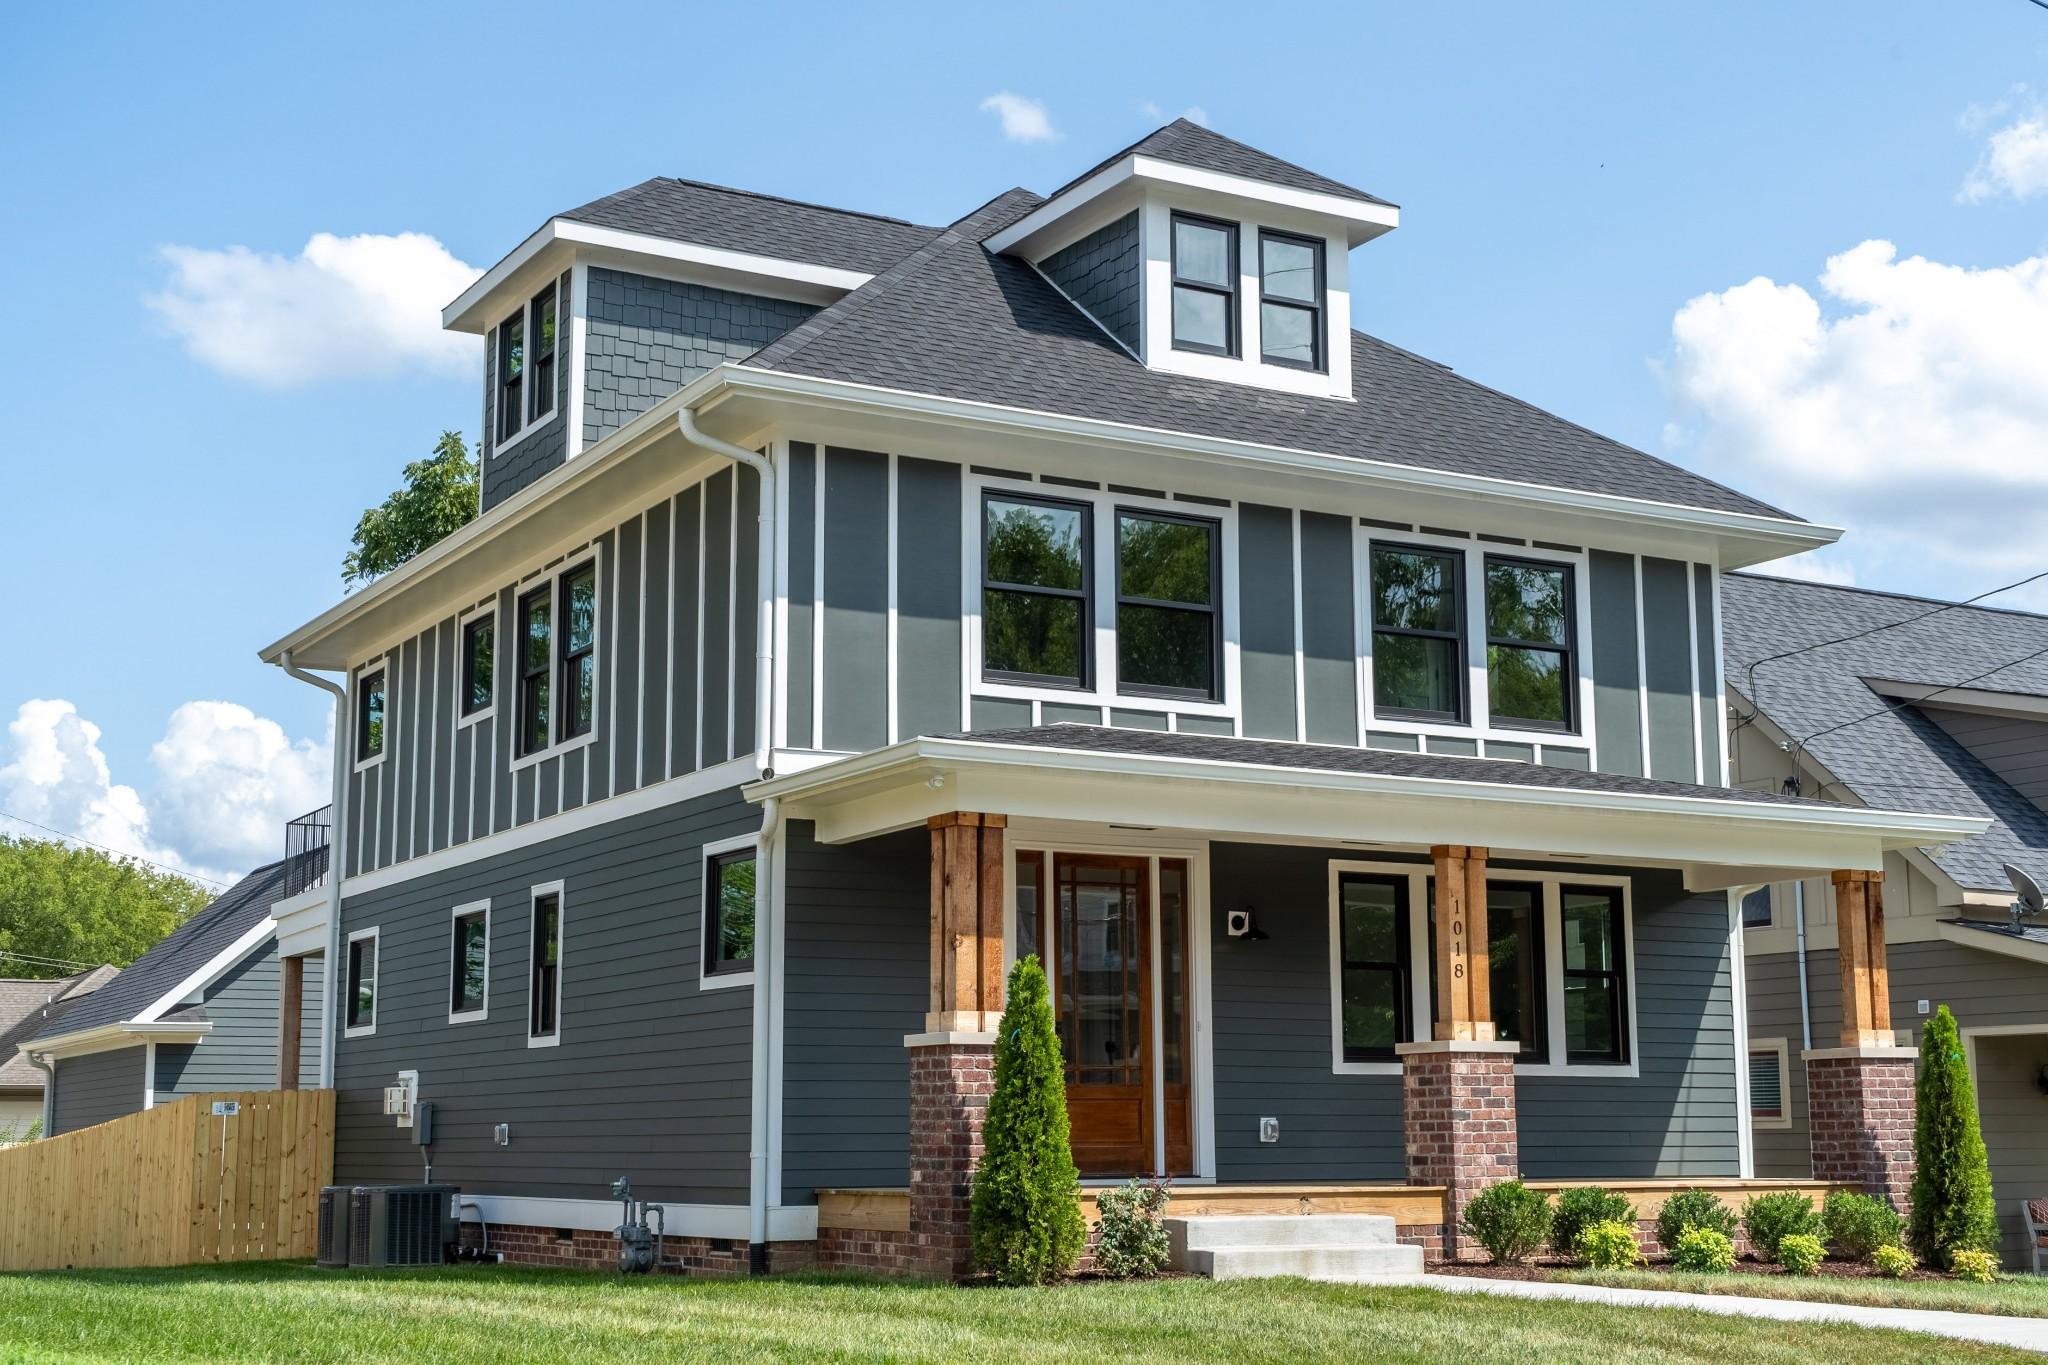 1018 11th Ave N Property Photo - Nashville, TN real estate listing